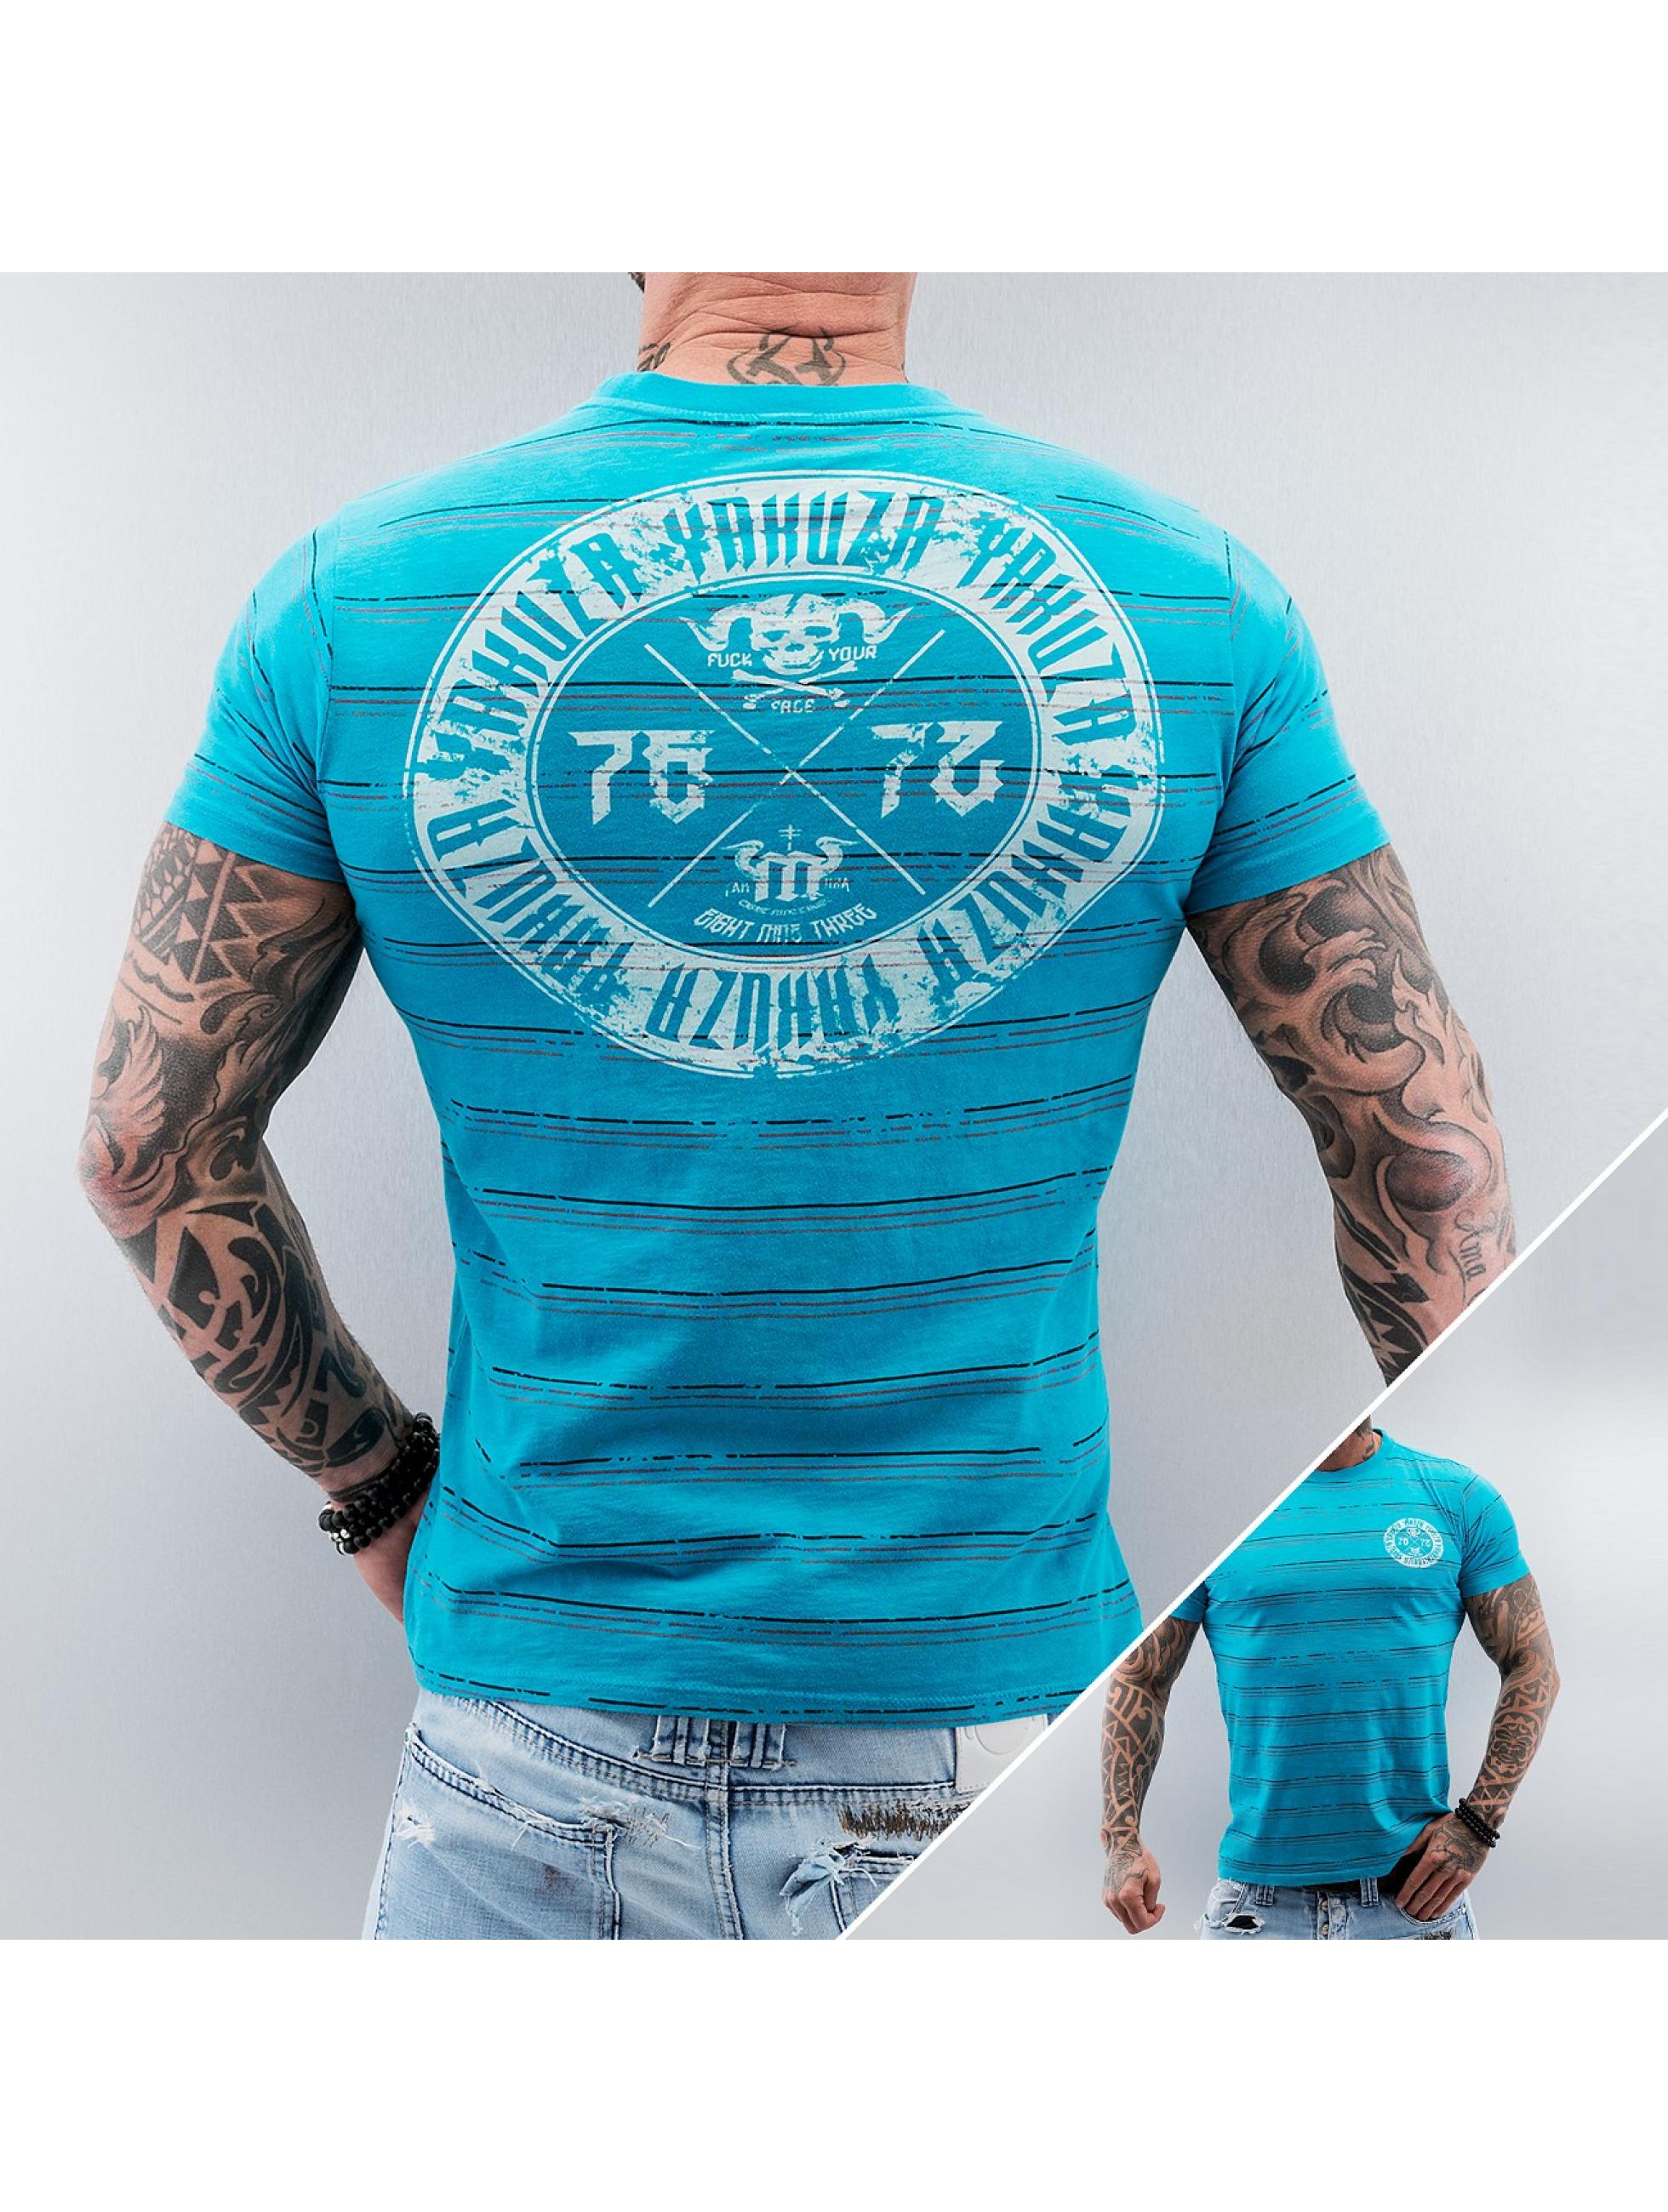 Yakuza Daily Use T Shirt Algiers Blue Moon